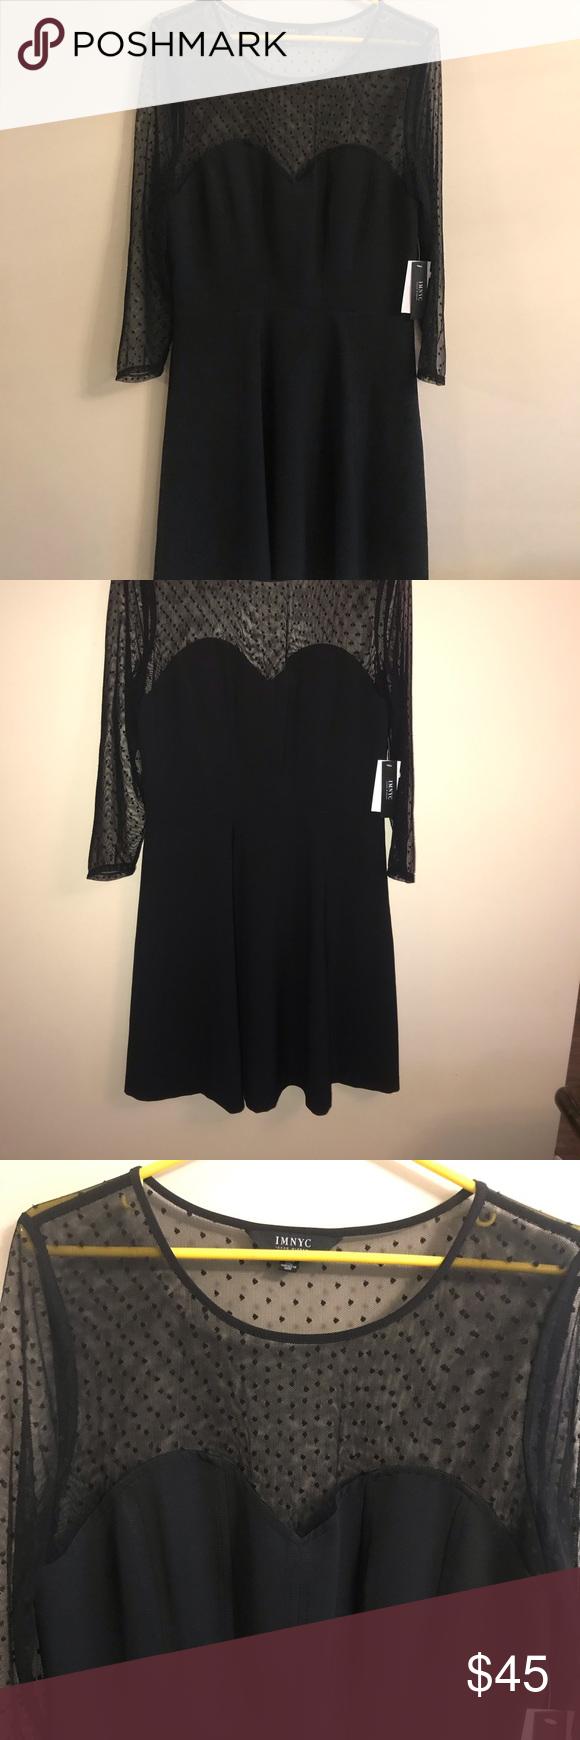 Nwt Black Dress With Sheer Polka Dot Detail Beautiful Dress New With Tags Black With Sheer Black Polka Dot Top And Arms D Clothes Design Fashion Black Dress [ 1740 x 580 Pixel ]